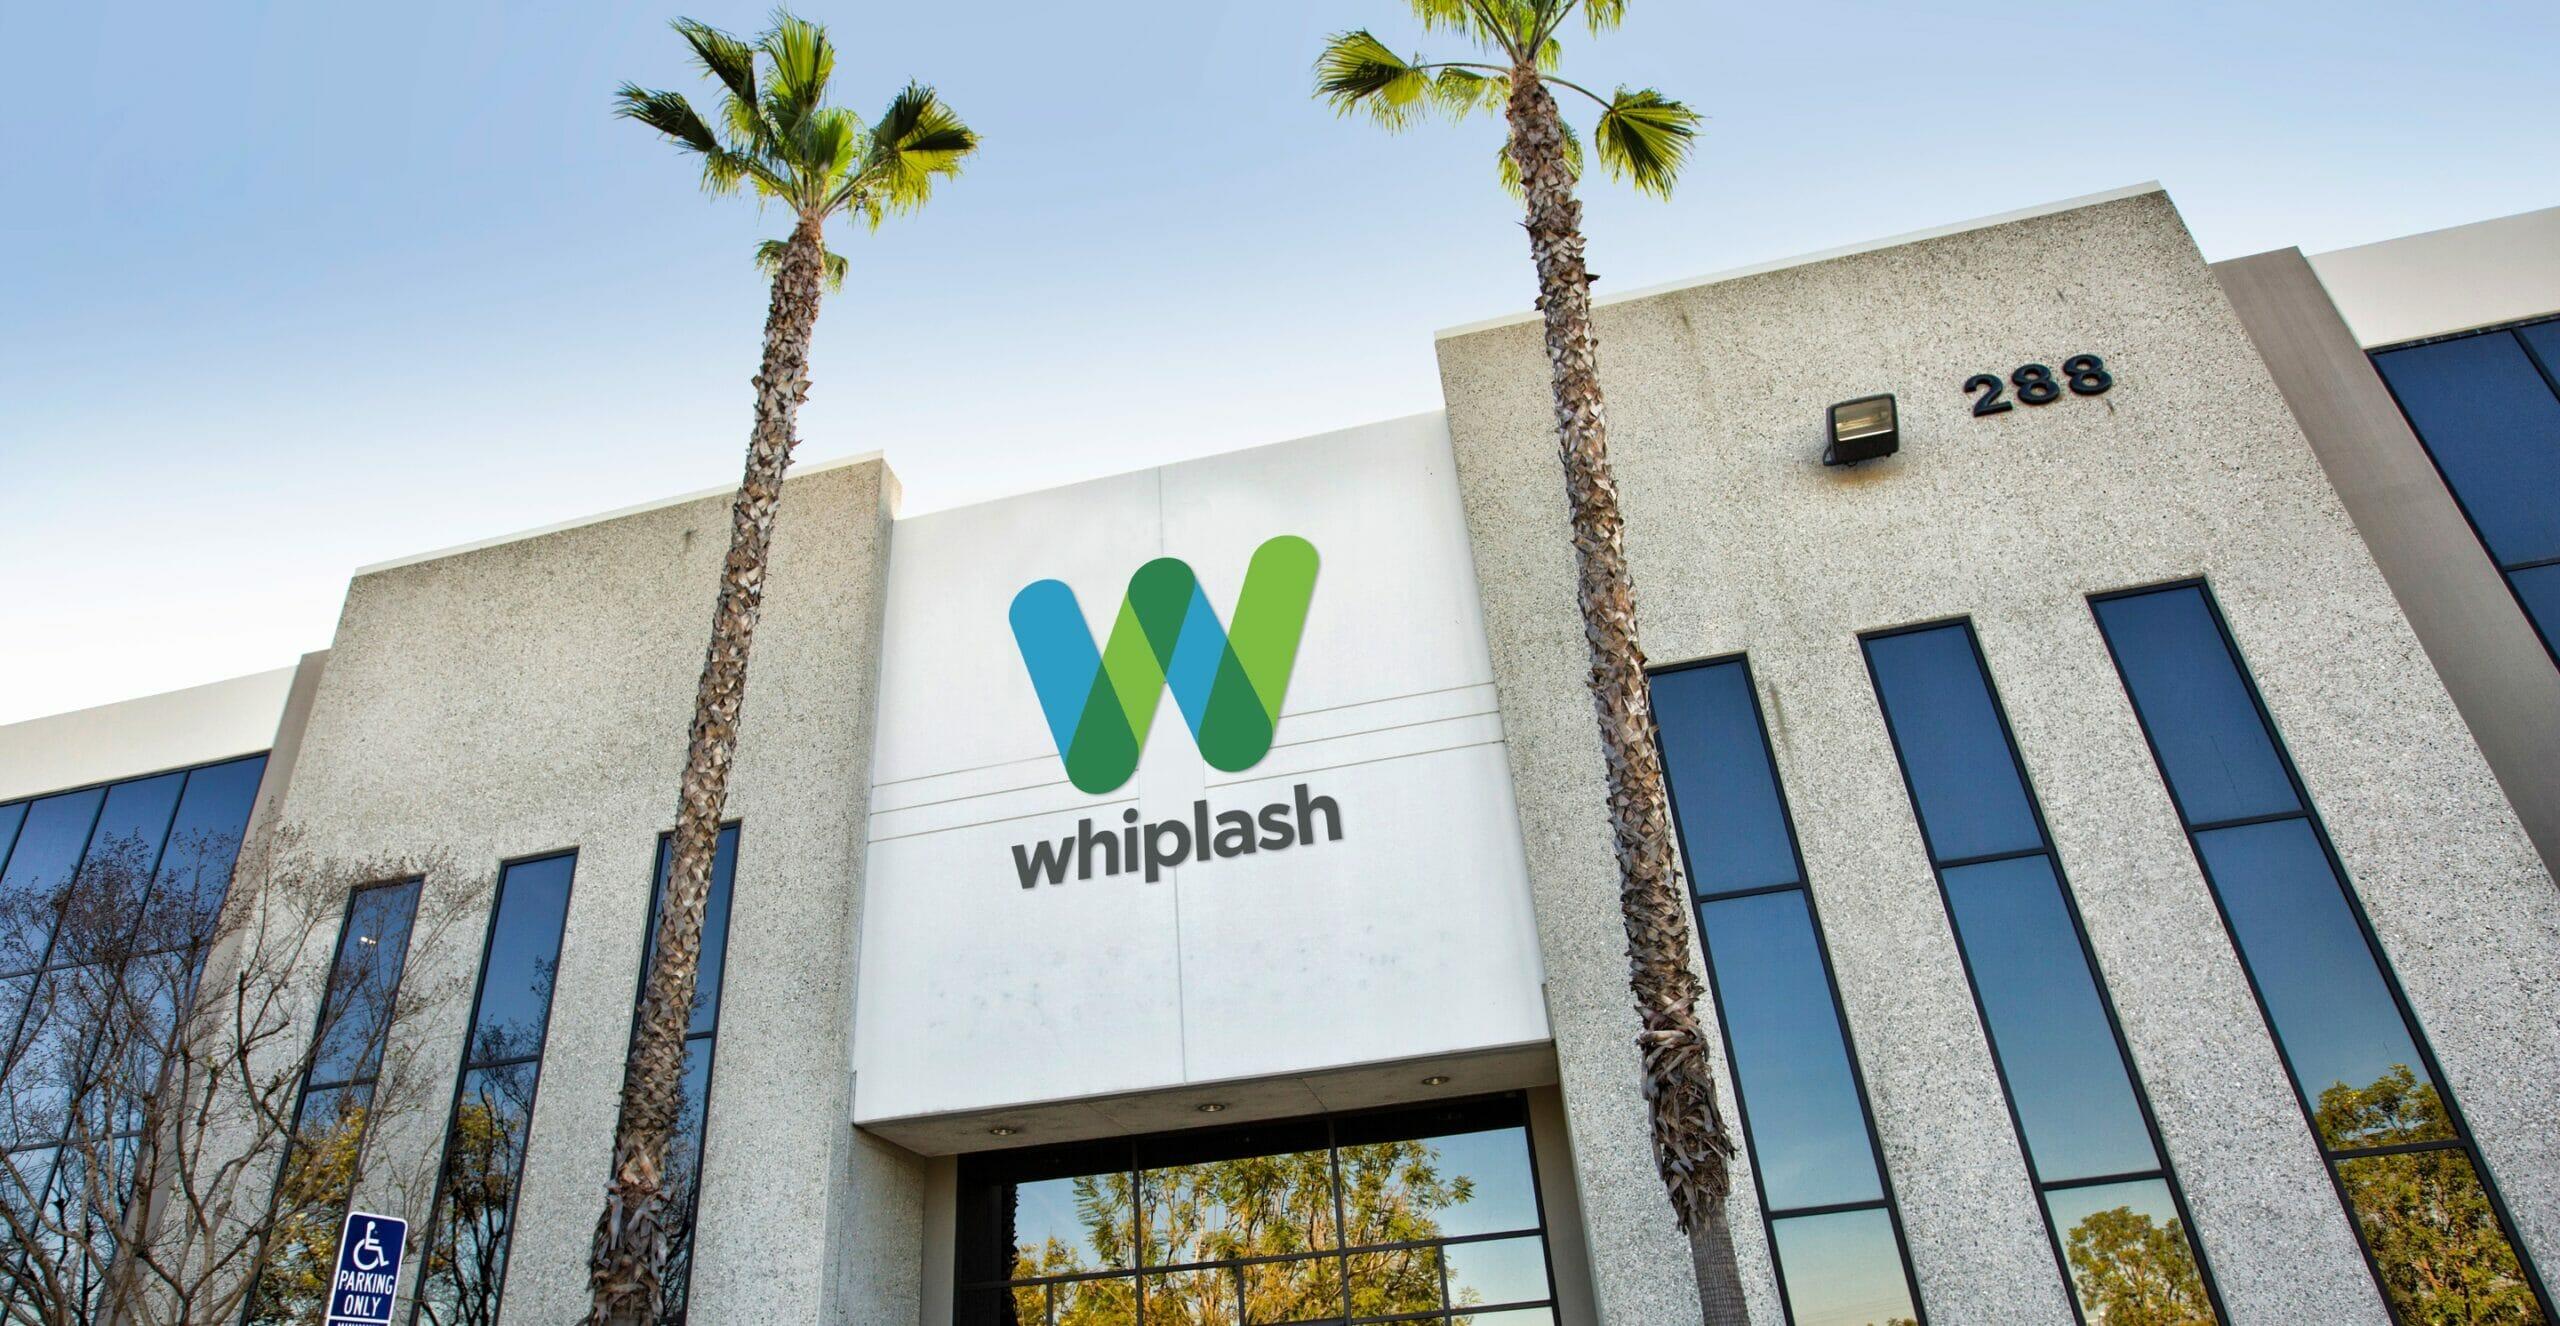 front of whiplash headquarters